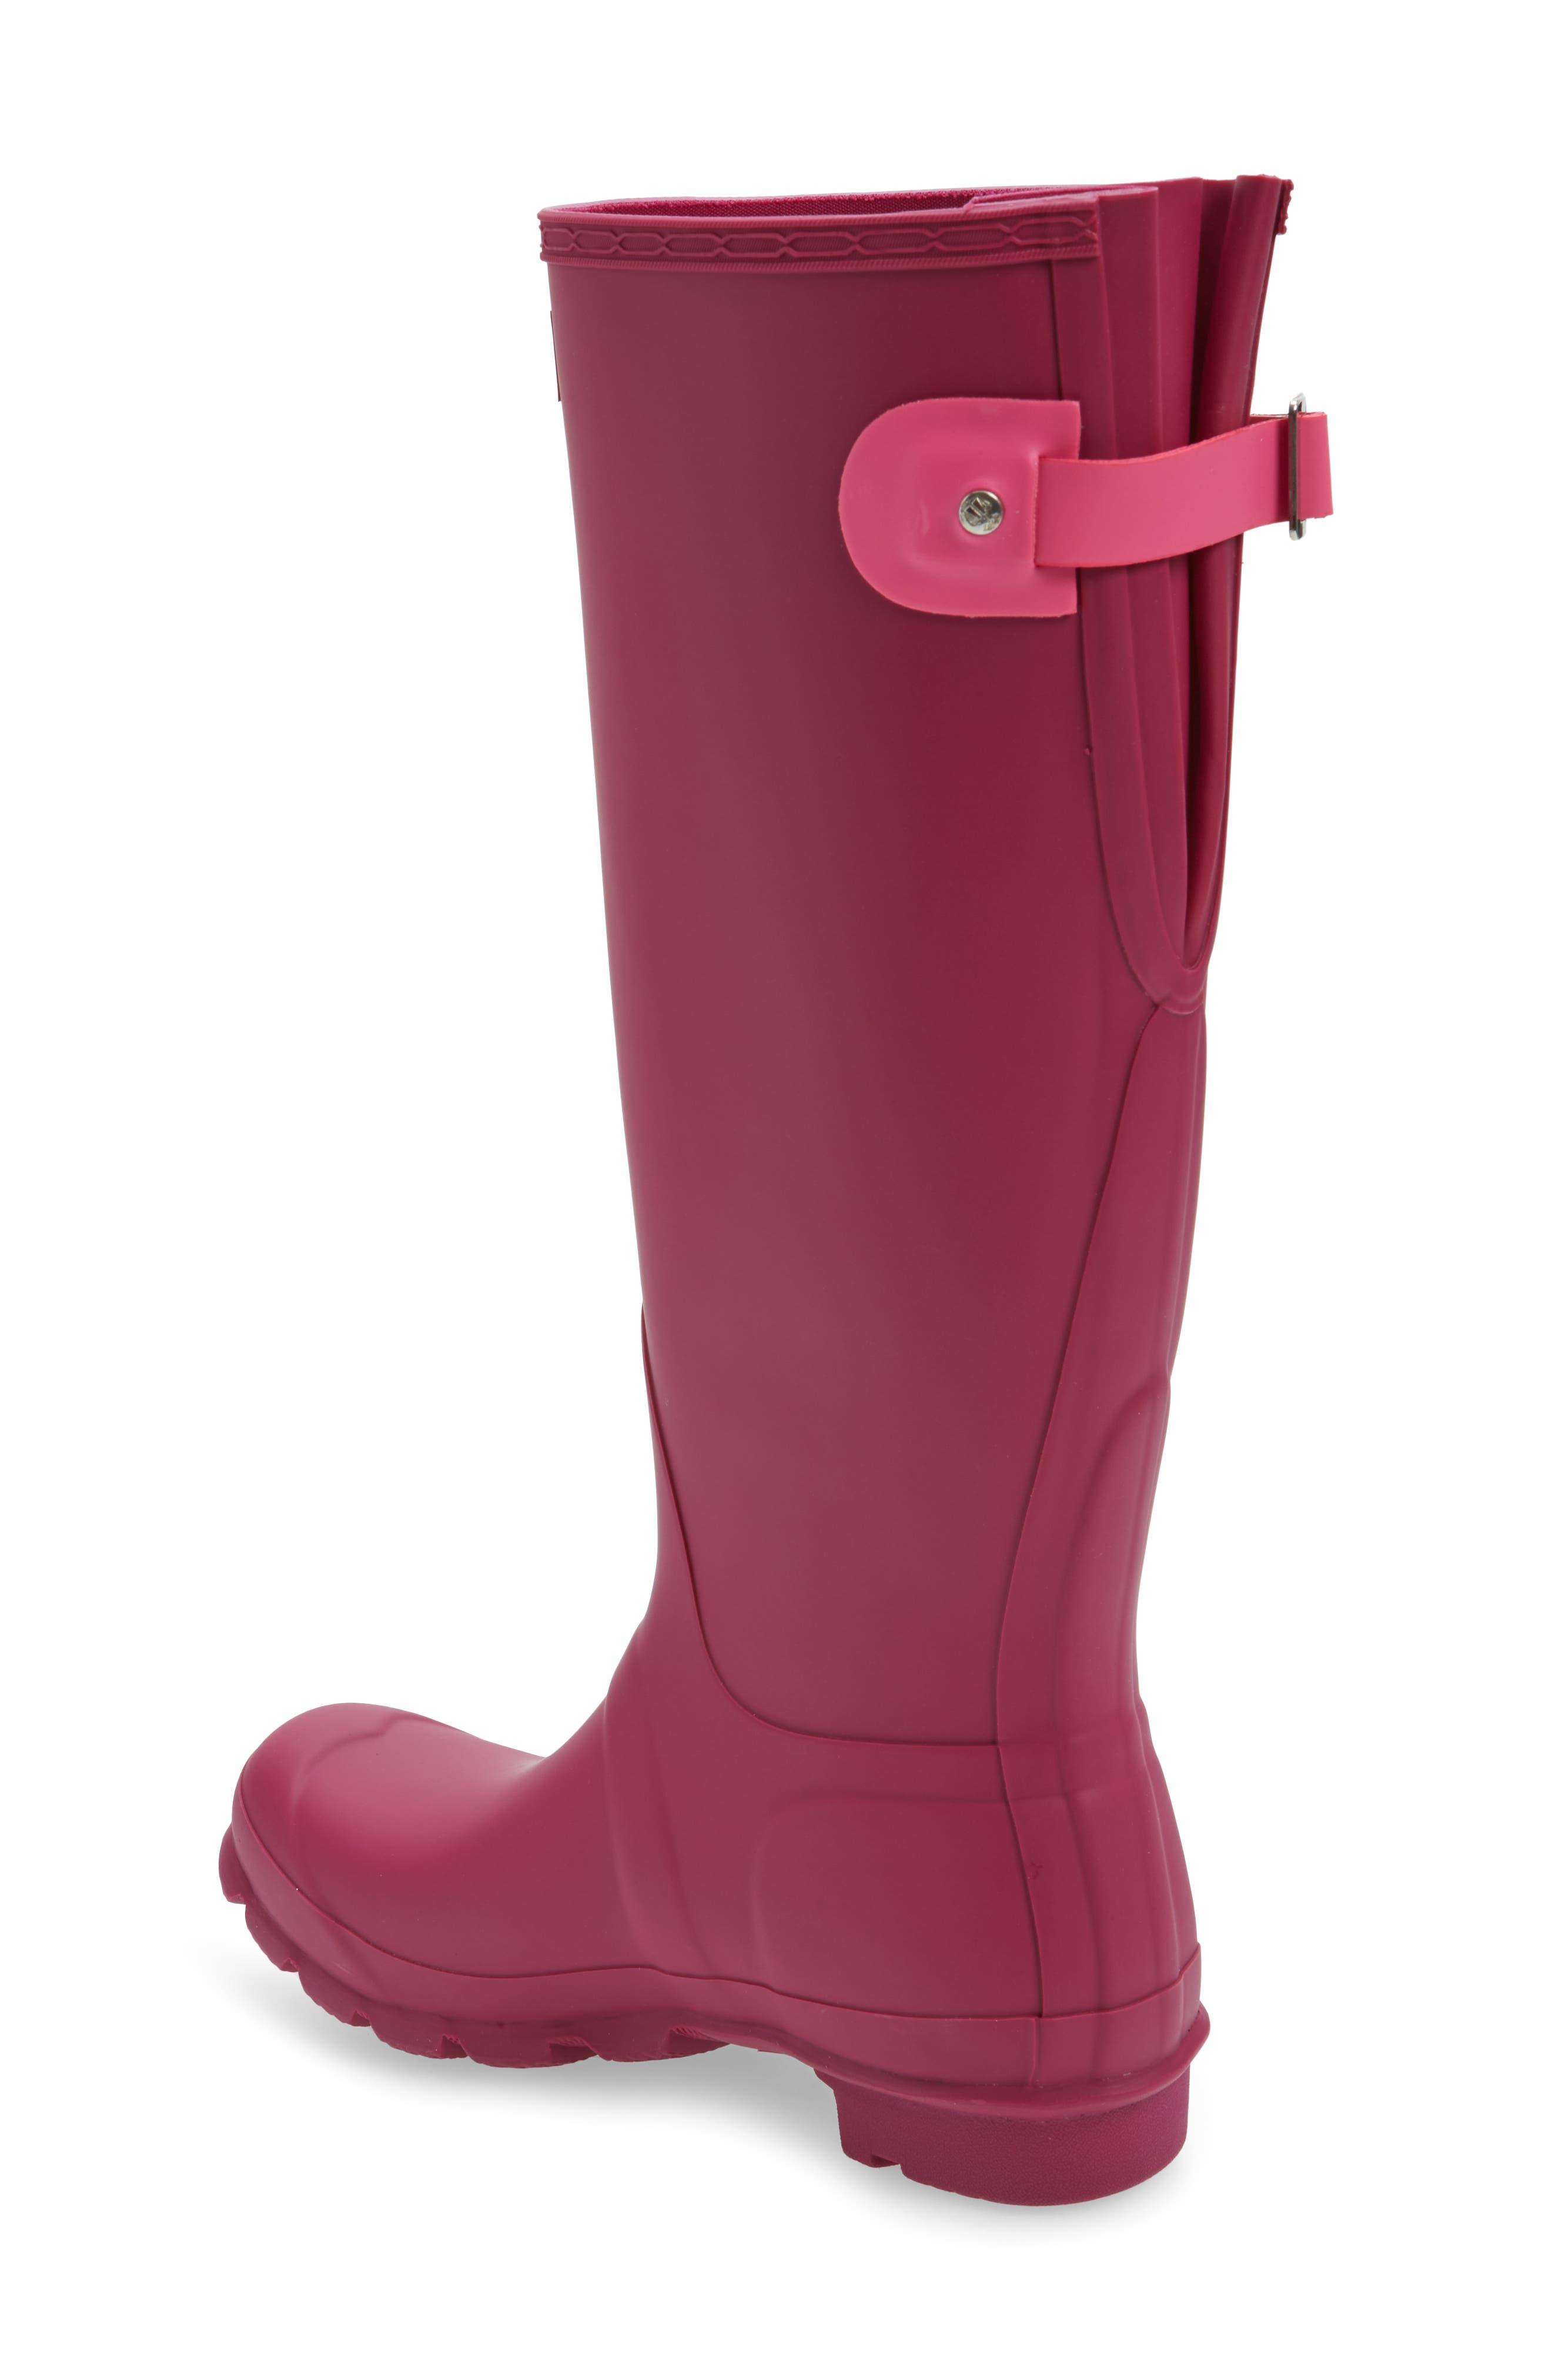 Adjustable Calf Rain Boot,                             Alternate thumbnail 2, color,                             Dark Ion Pink/ Ion Pink